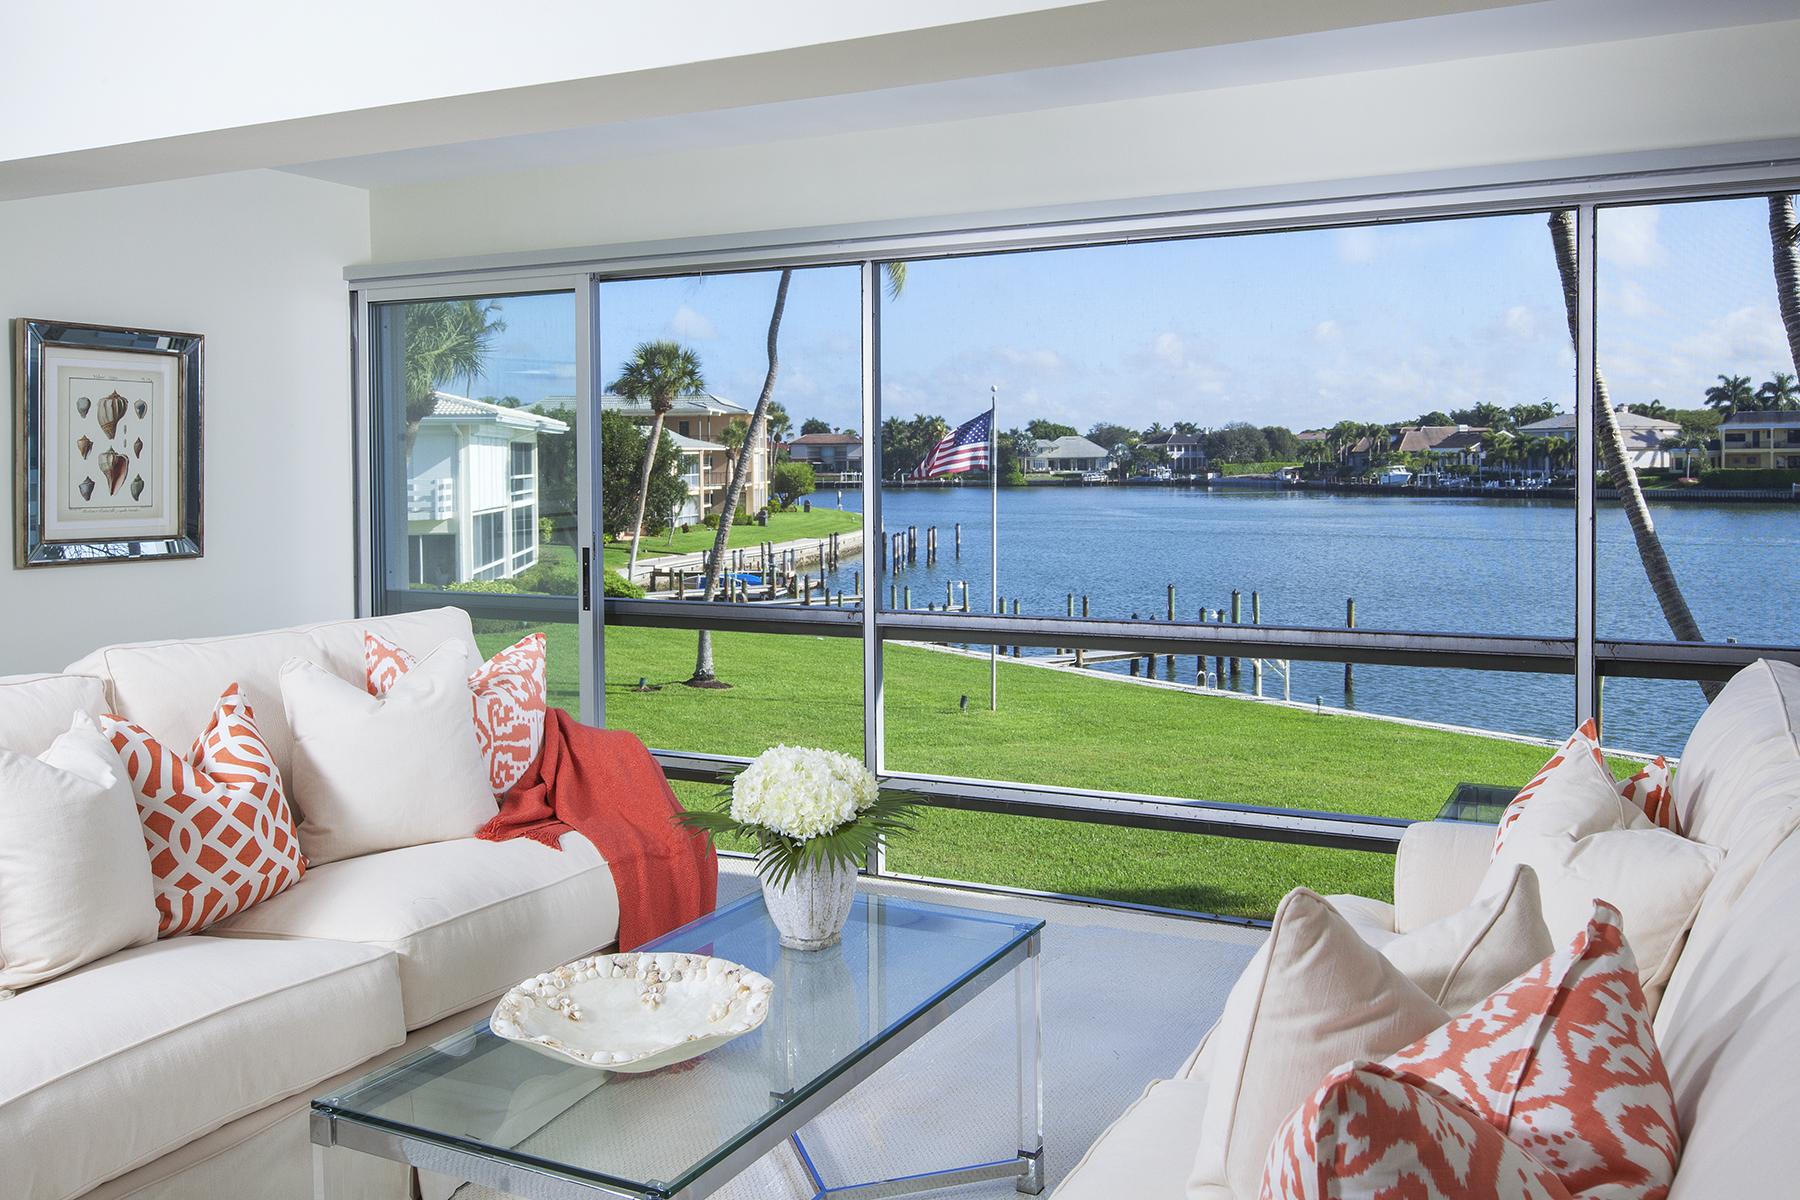 Condominium for Sale at MOORINGS - EXECUTIVE CLUB 3300 Gulf Shore Blvd N 213 Naples, Florida, 34103 United States